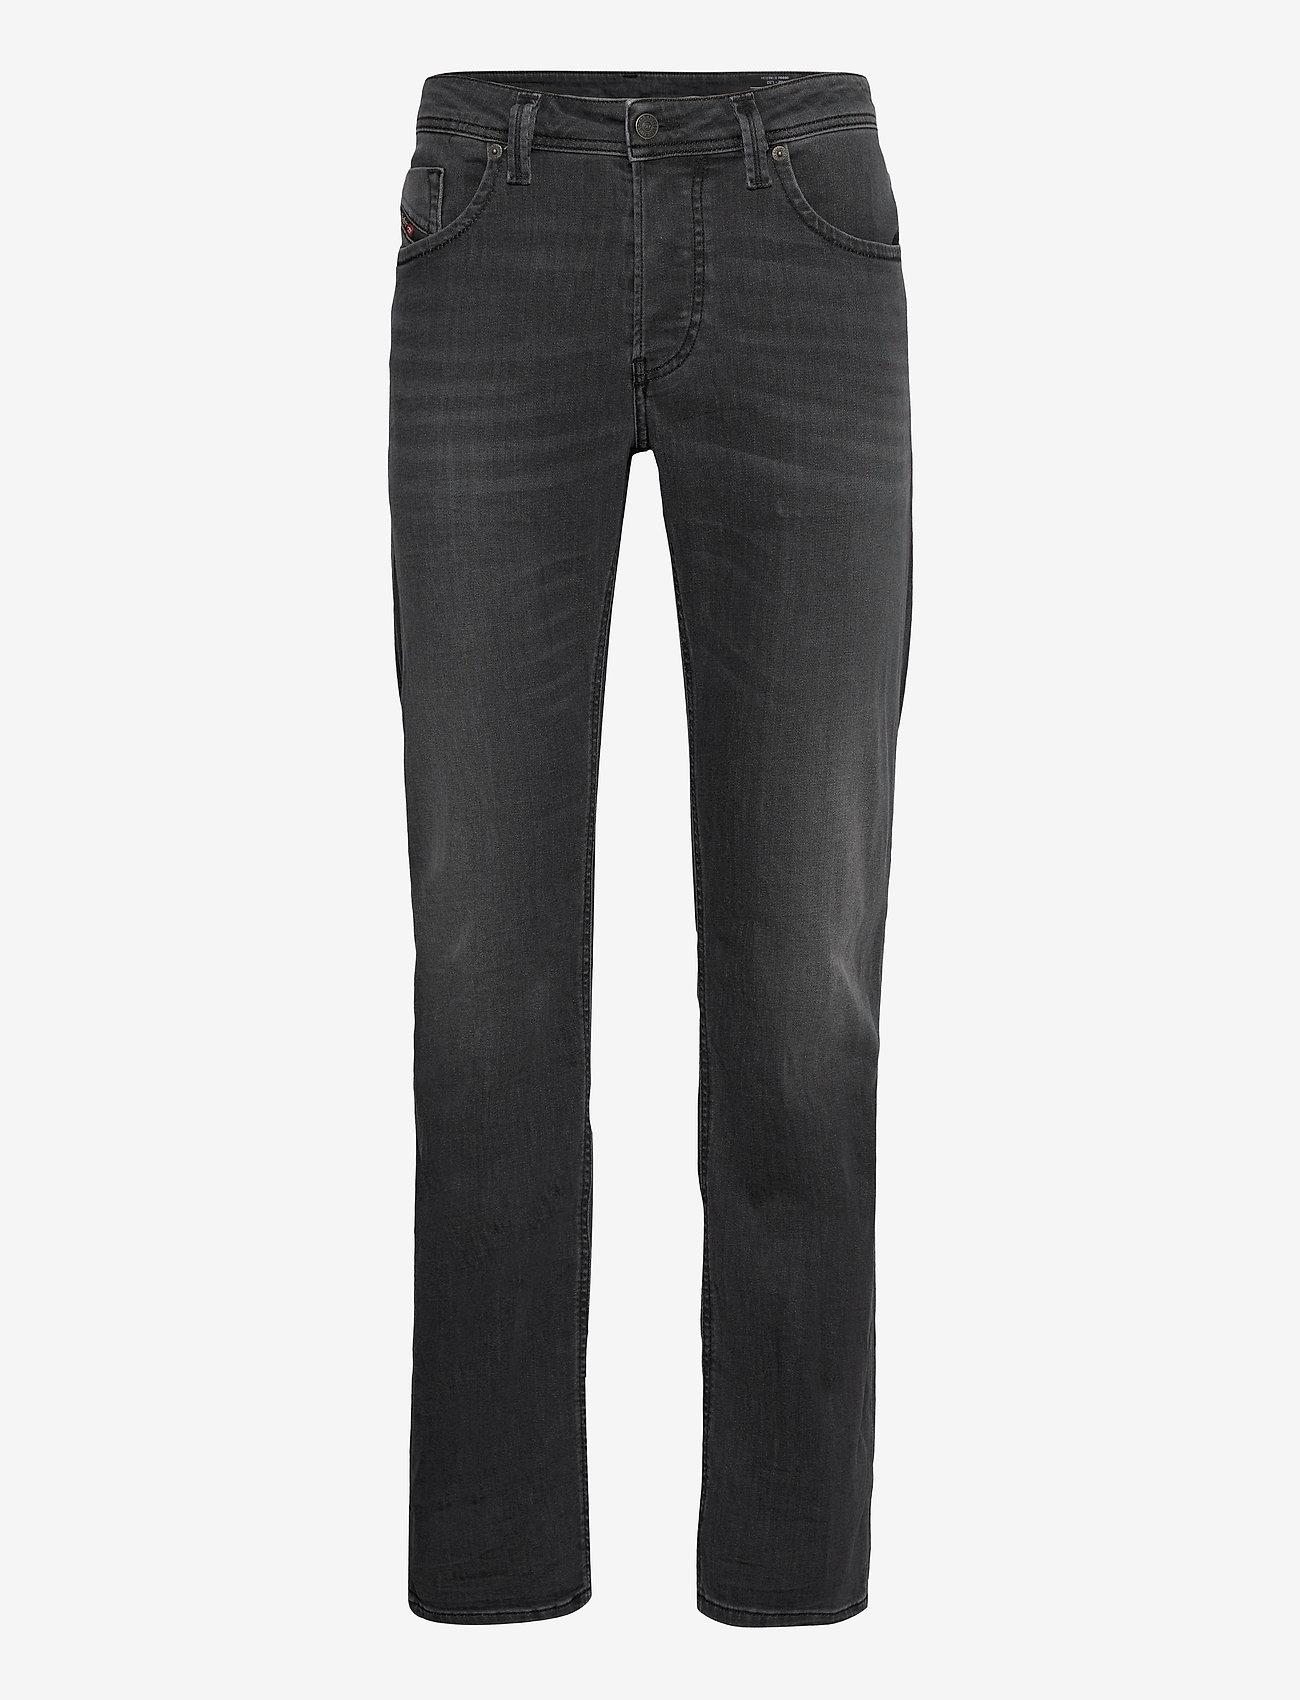 Diesel Men - LARKEE-X L.32 TROUSERS - regular jeans - black/denim - 0